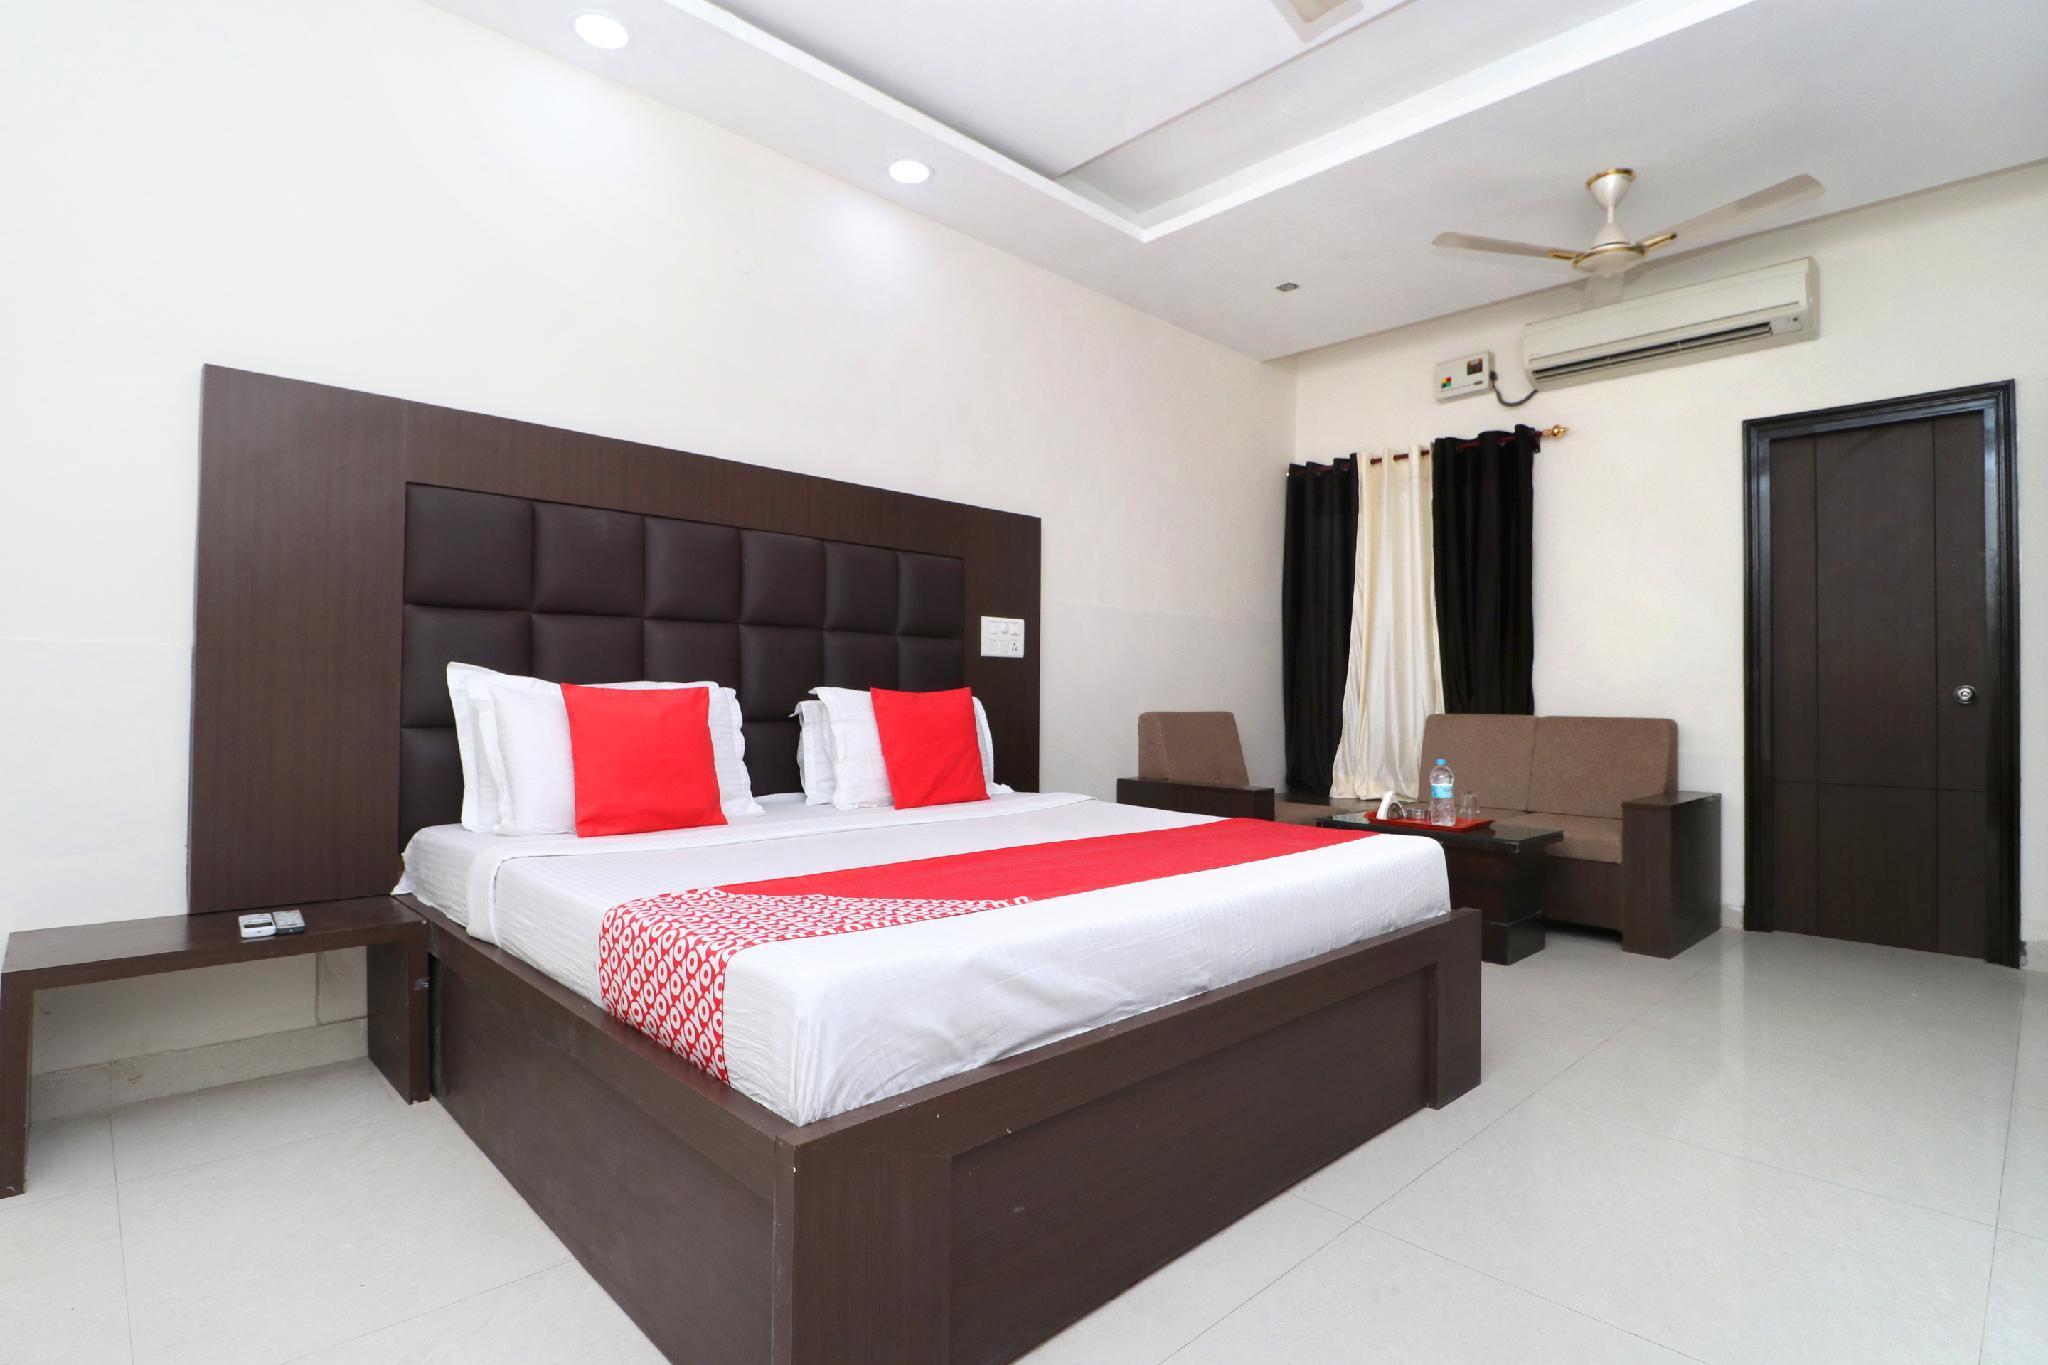 OYO 3404 Hotel Ahluwalia Regency, Bathinda